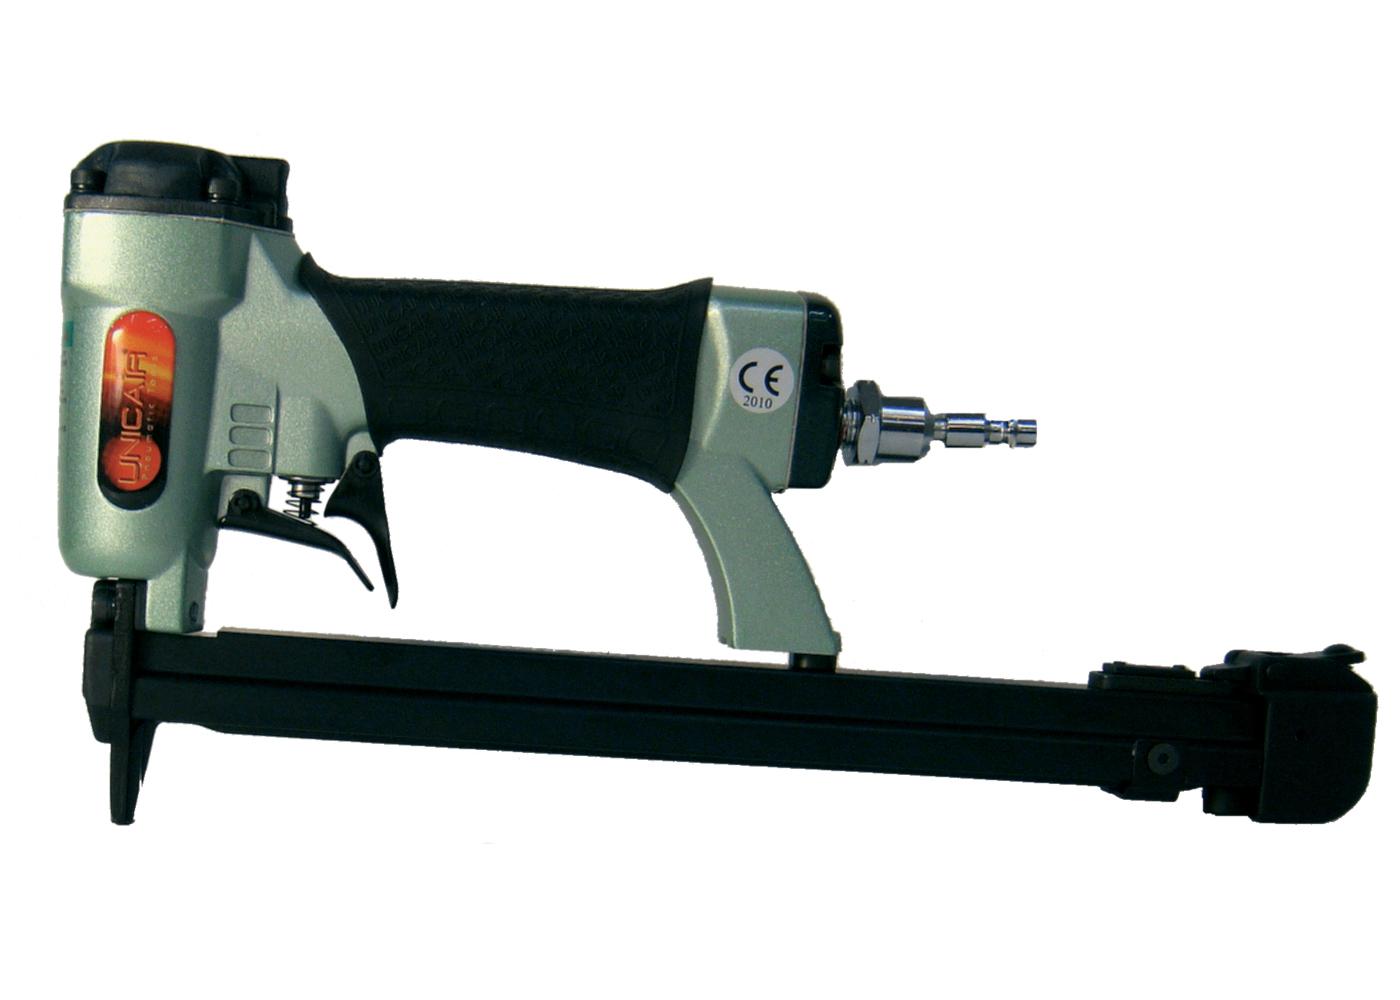 Grapadora G-80/16 CL